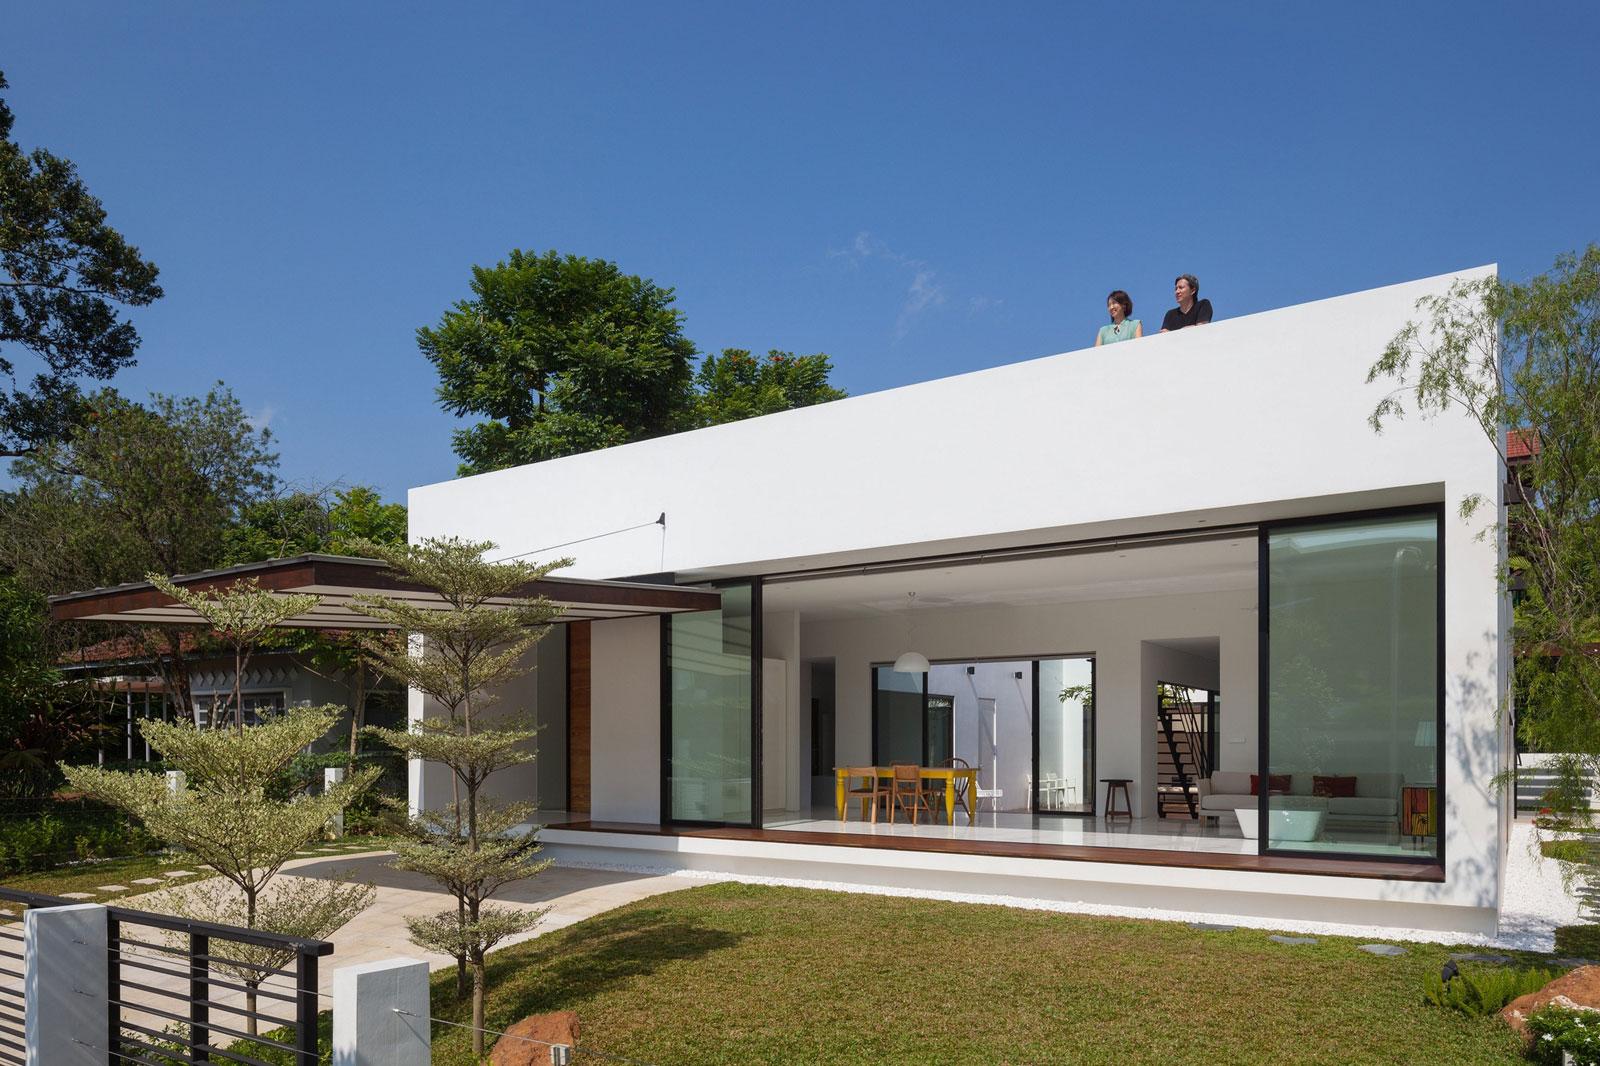 Casas de un piso casas y fachadas mejor conjunto de frases for Casa moderna wiki